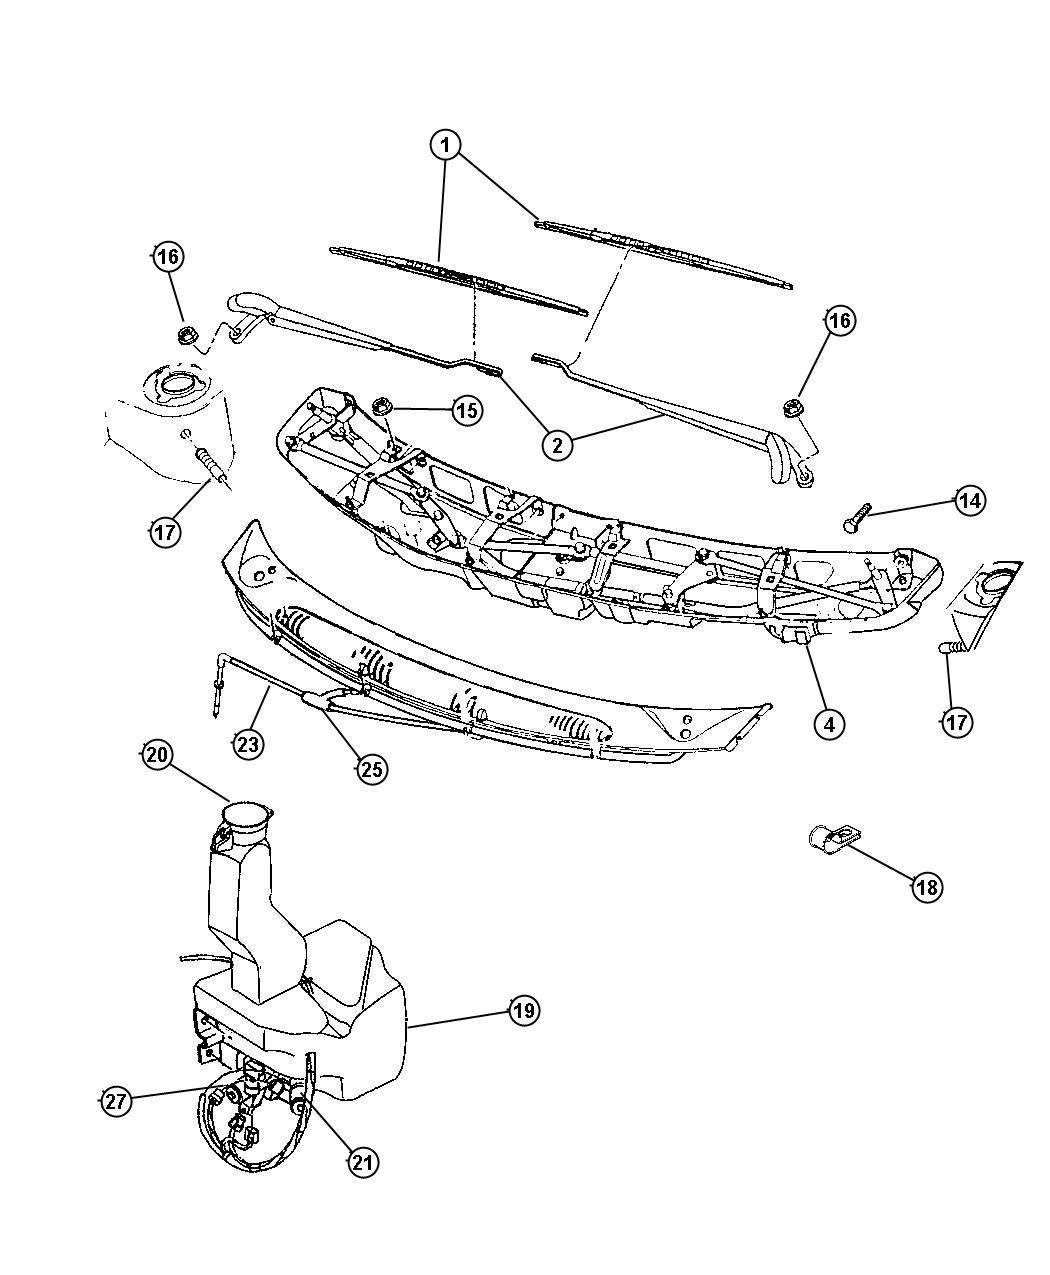 plymouth cruise control diagram